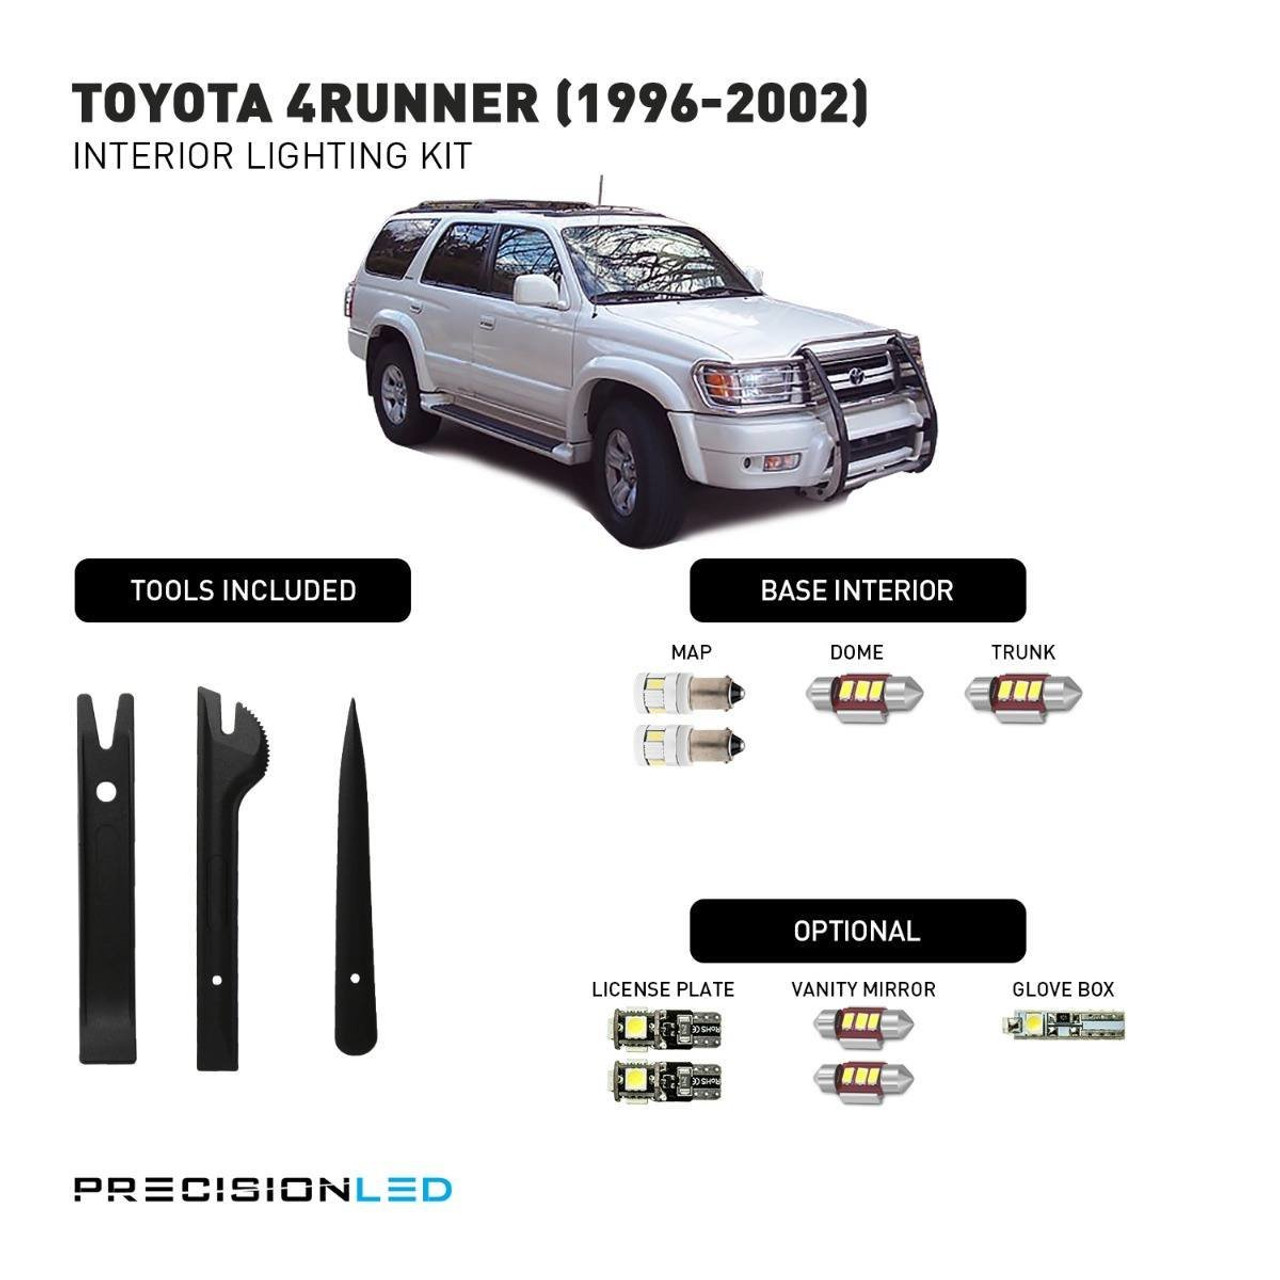 Toyota 4Runner Premium LED Interior Package (1996-2002)